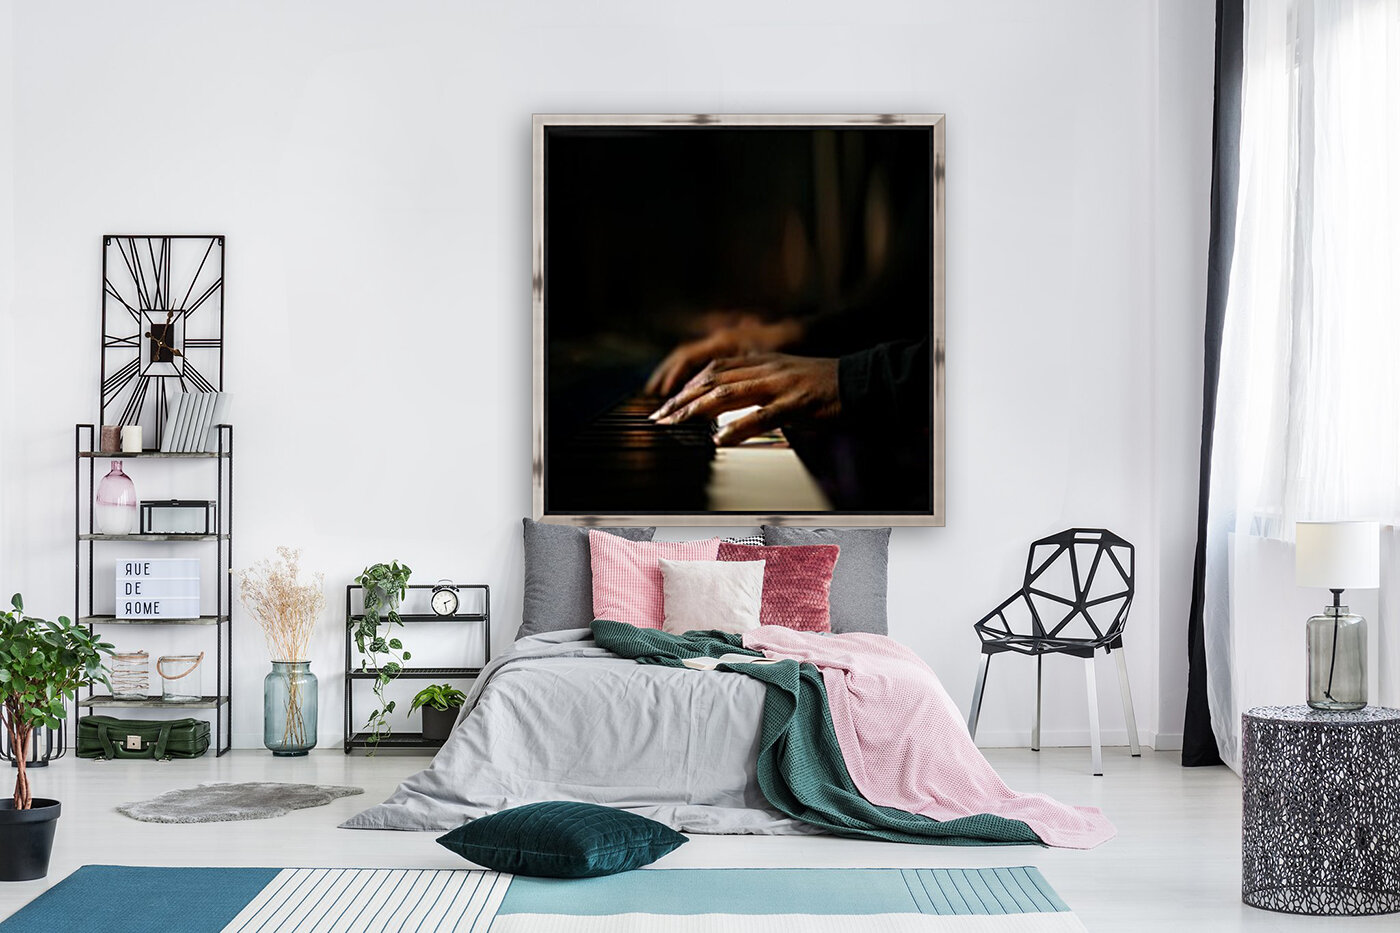 Hands playing piano close-up  Art